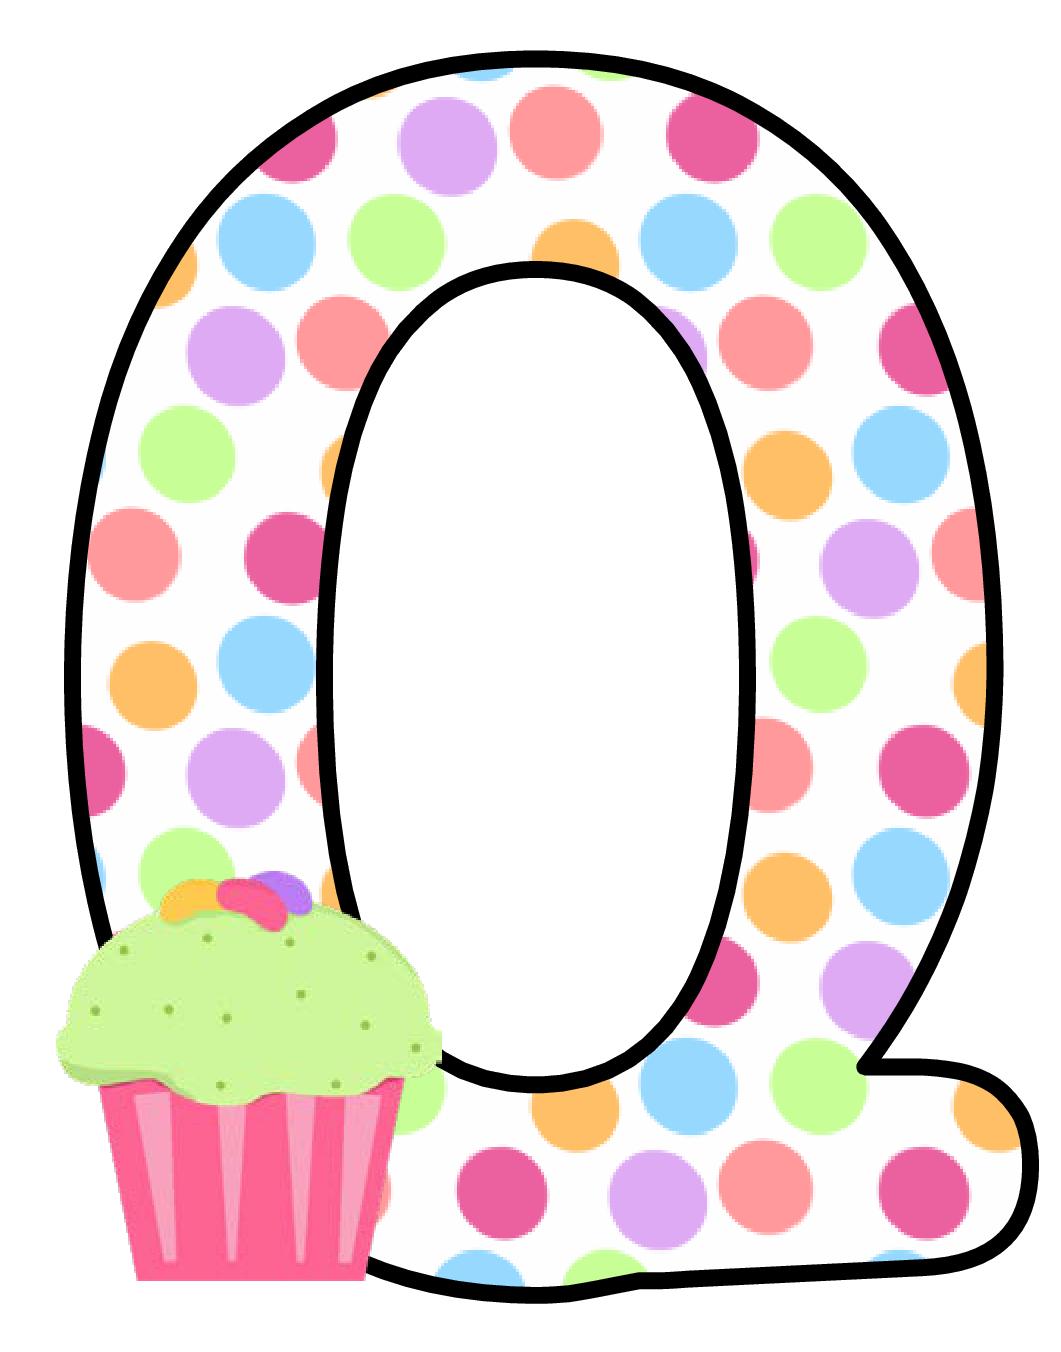 Ch b alfabeto cupcake. Queen clipart alphabet q